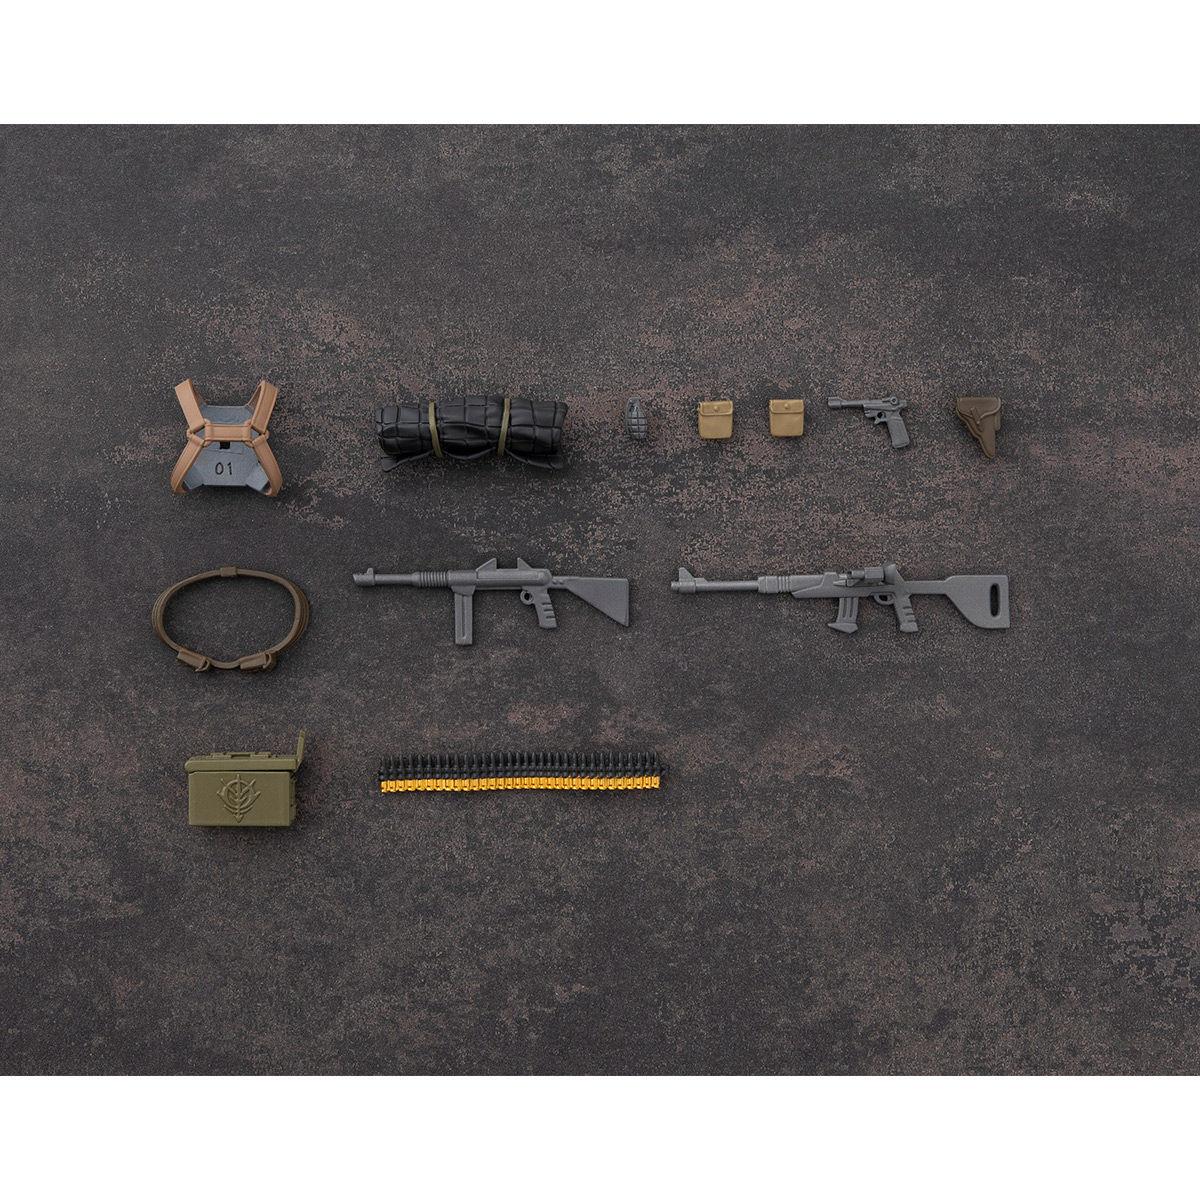 G.M.G. ガンダムミリタリージェネレーション『ジオン公国軍一般兵士01』1/18 可動フィギュア-007